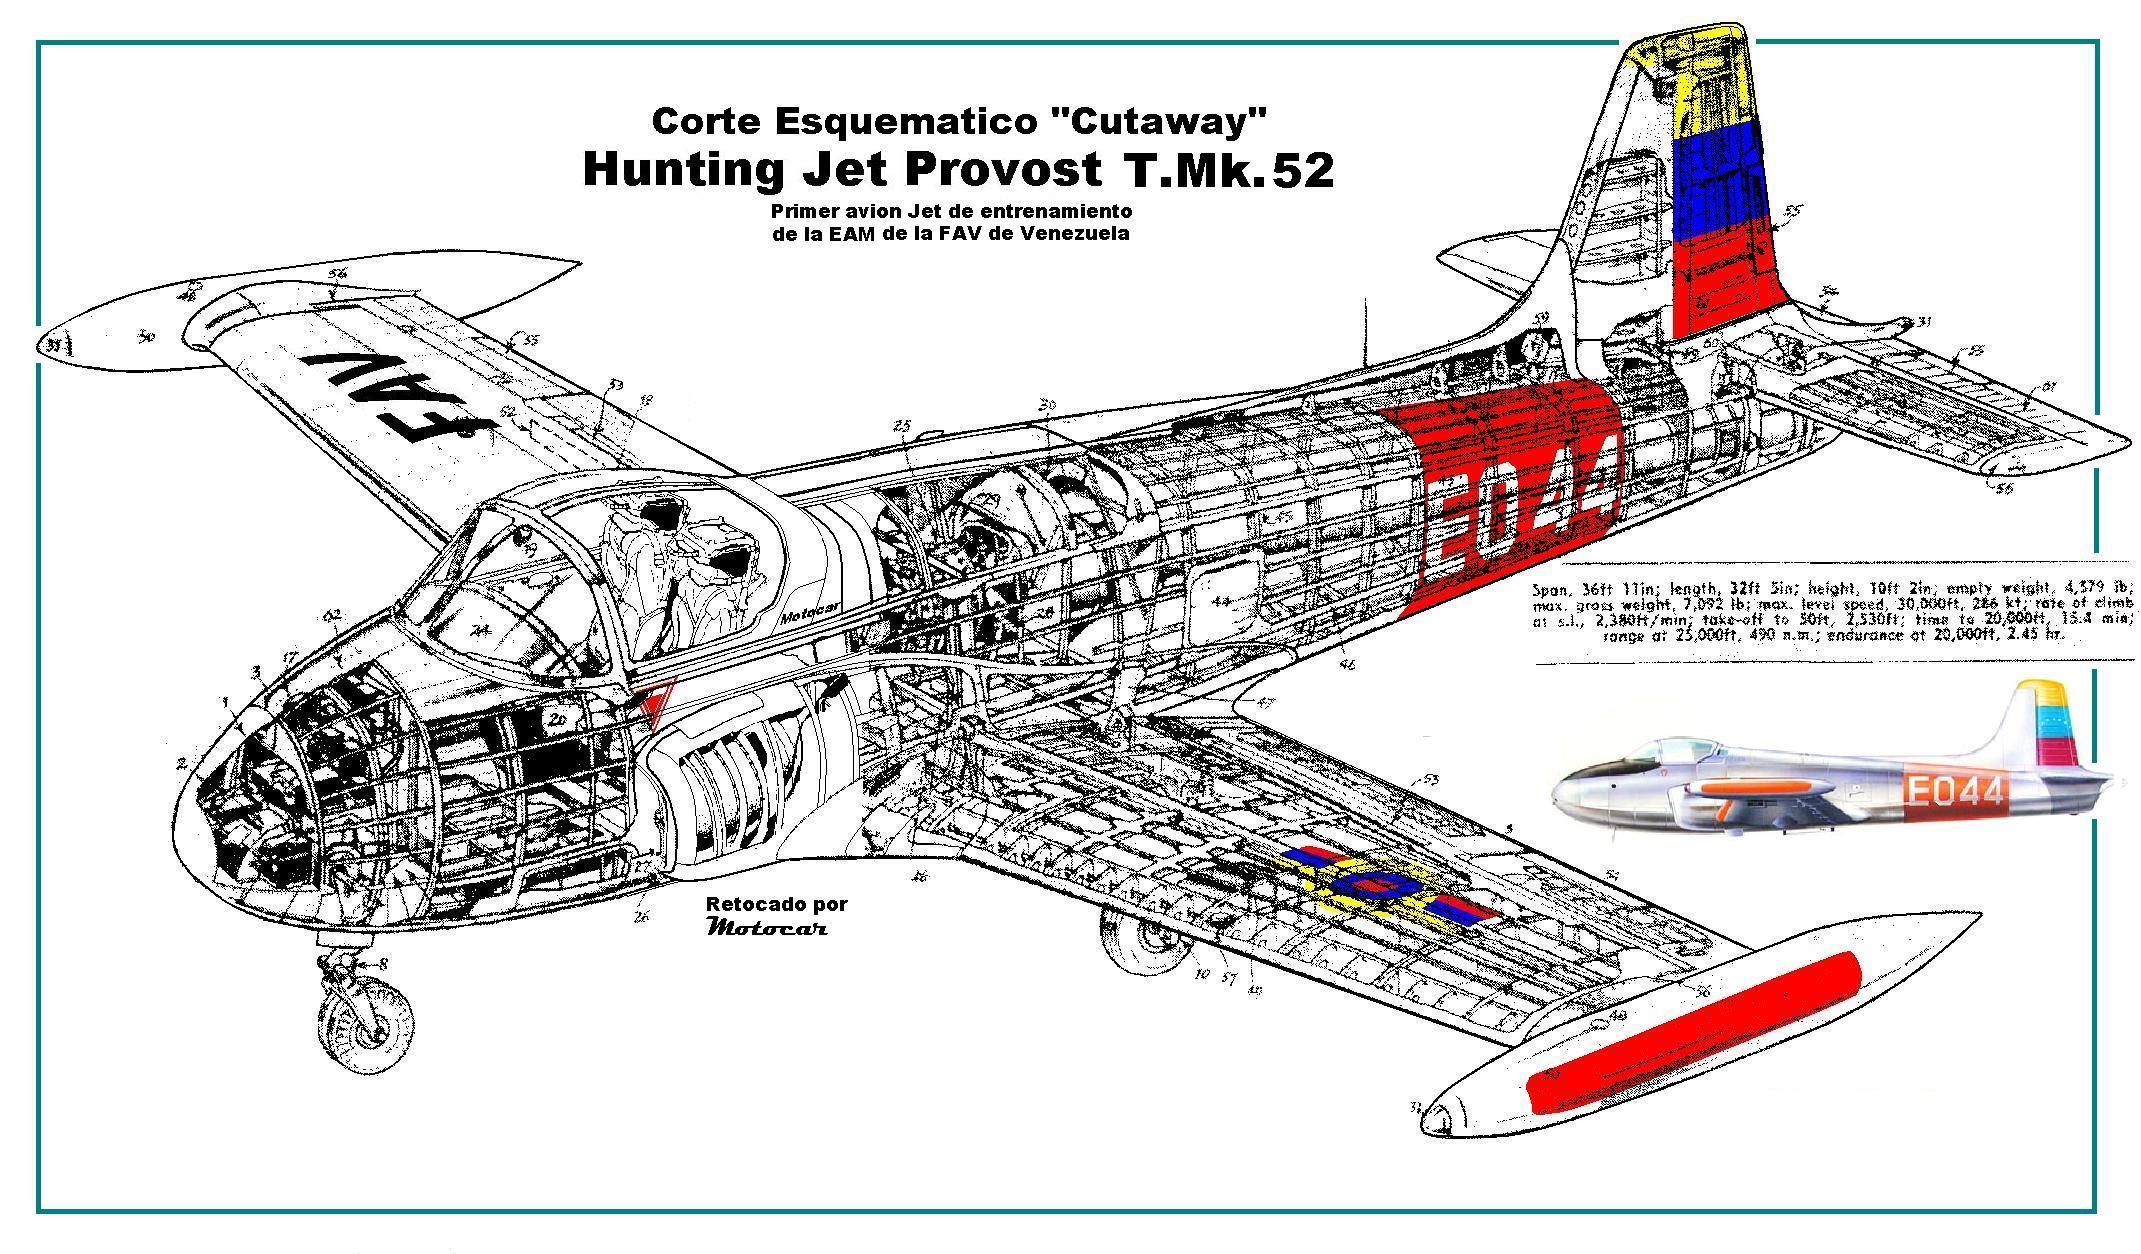 Entrenadores - Página 39 Cutaway_Hunting_Jet_Provost_EAM_FAV